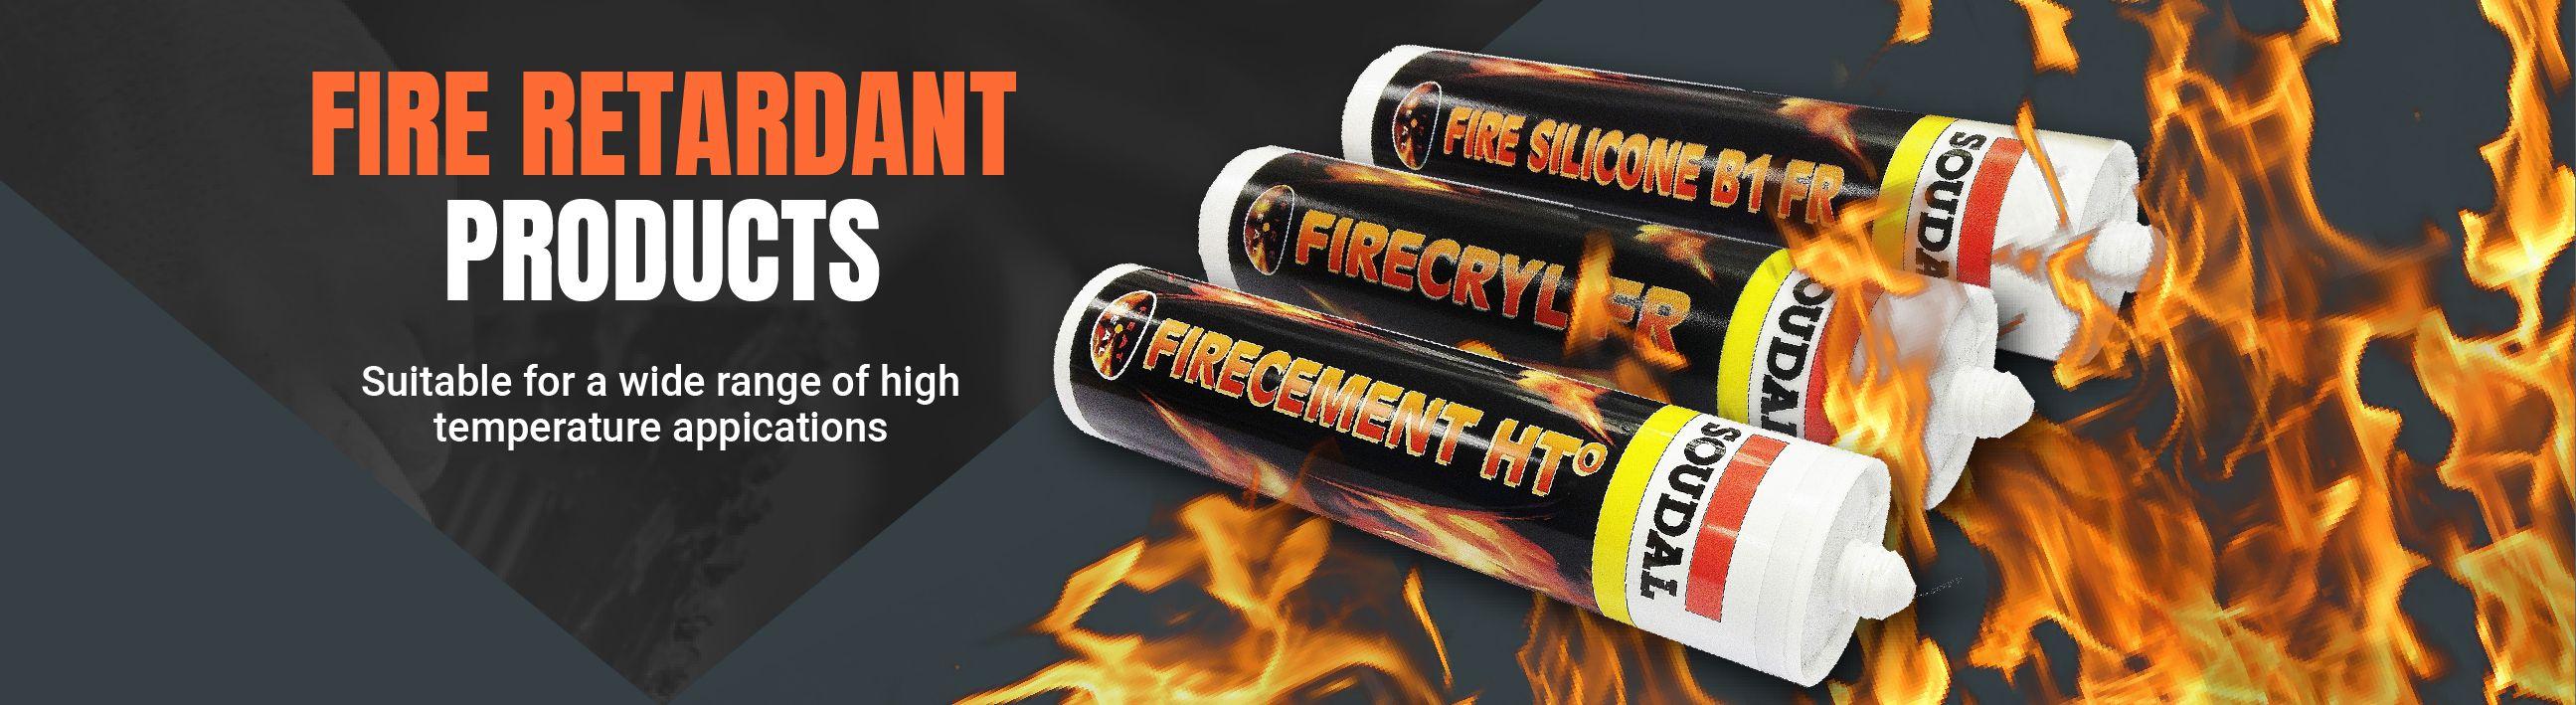 Fire Retardant Products